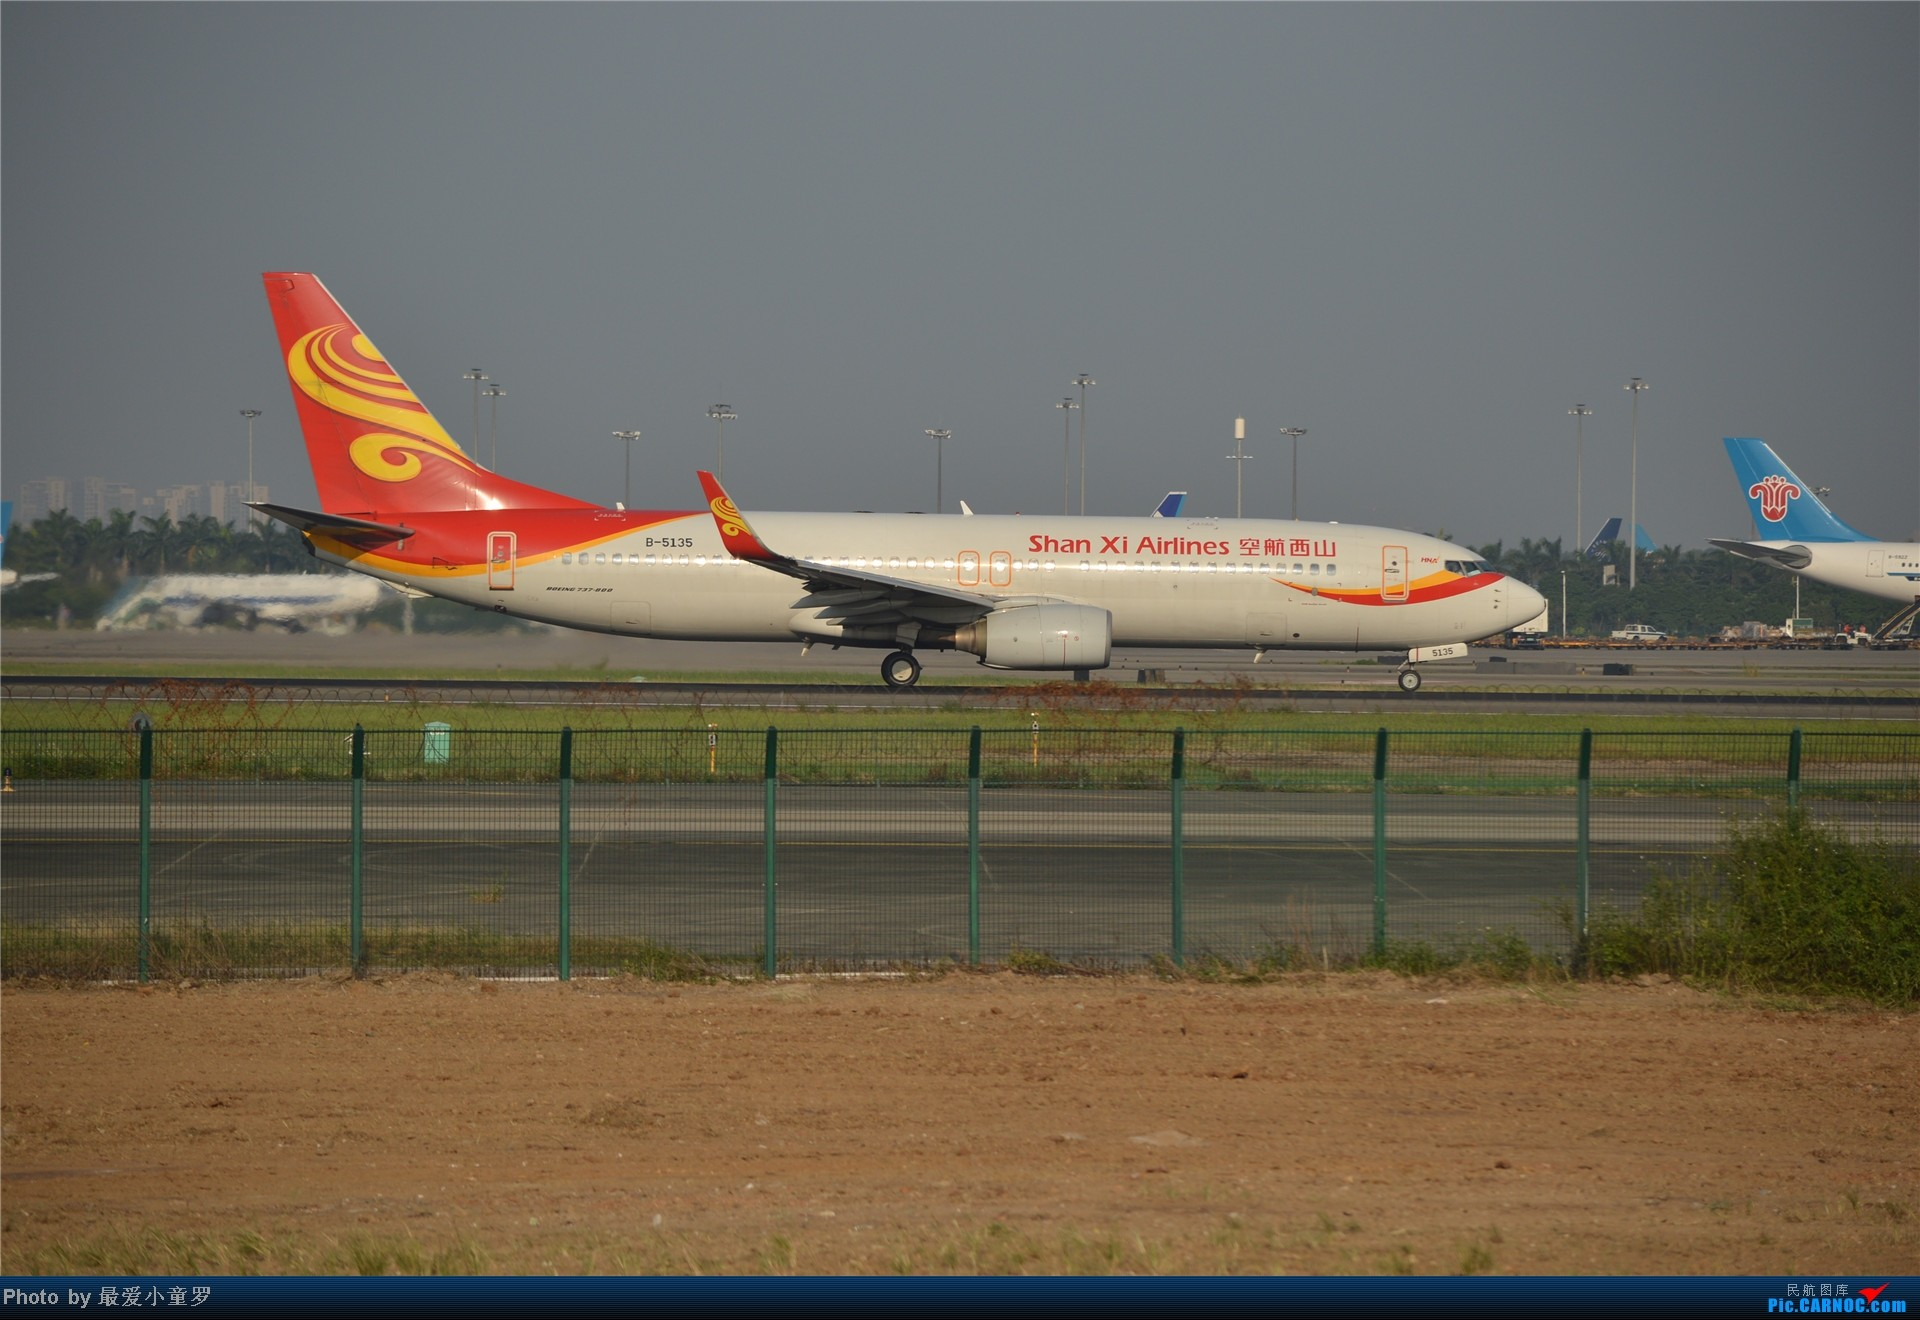 Re:[原创]炒冷饭贴之13年10月2日CAN拍机杂图系列 BOEING 737-800 B-5135 中国广州白云机场